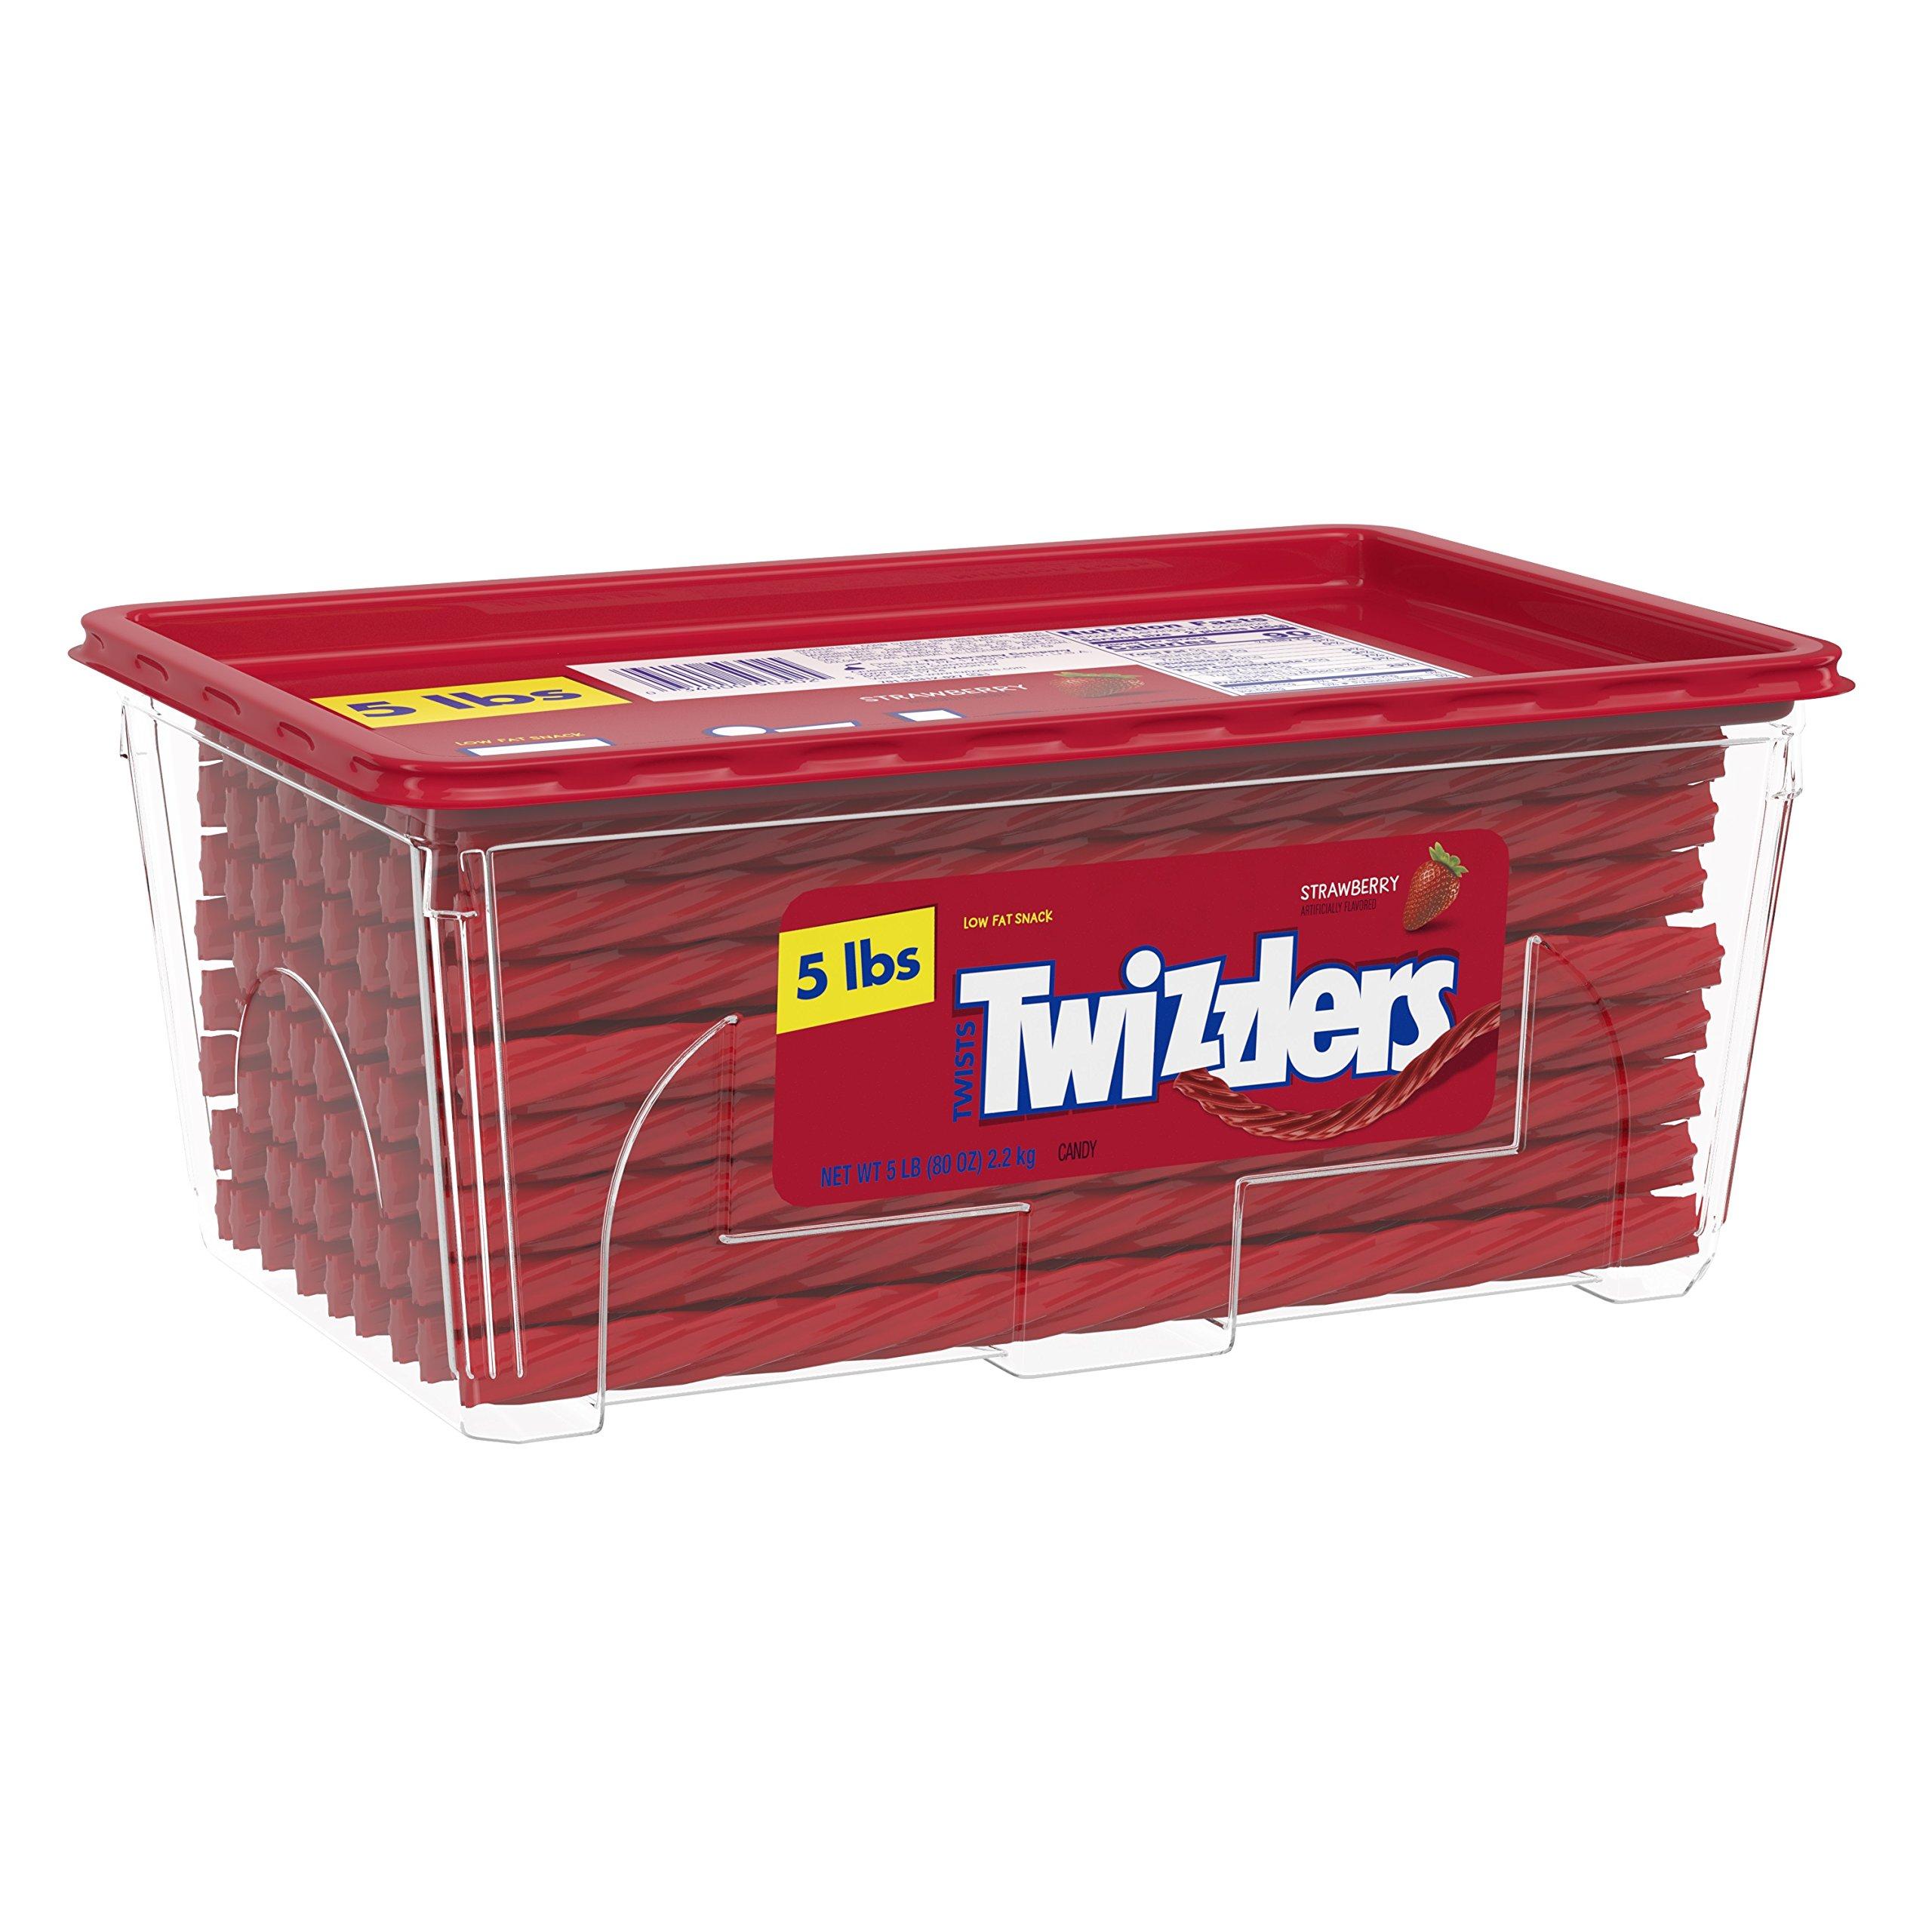 TWIZZLERS Licorice Halloween Candy, Strawberry, 5 Pound by Twizzlers